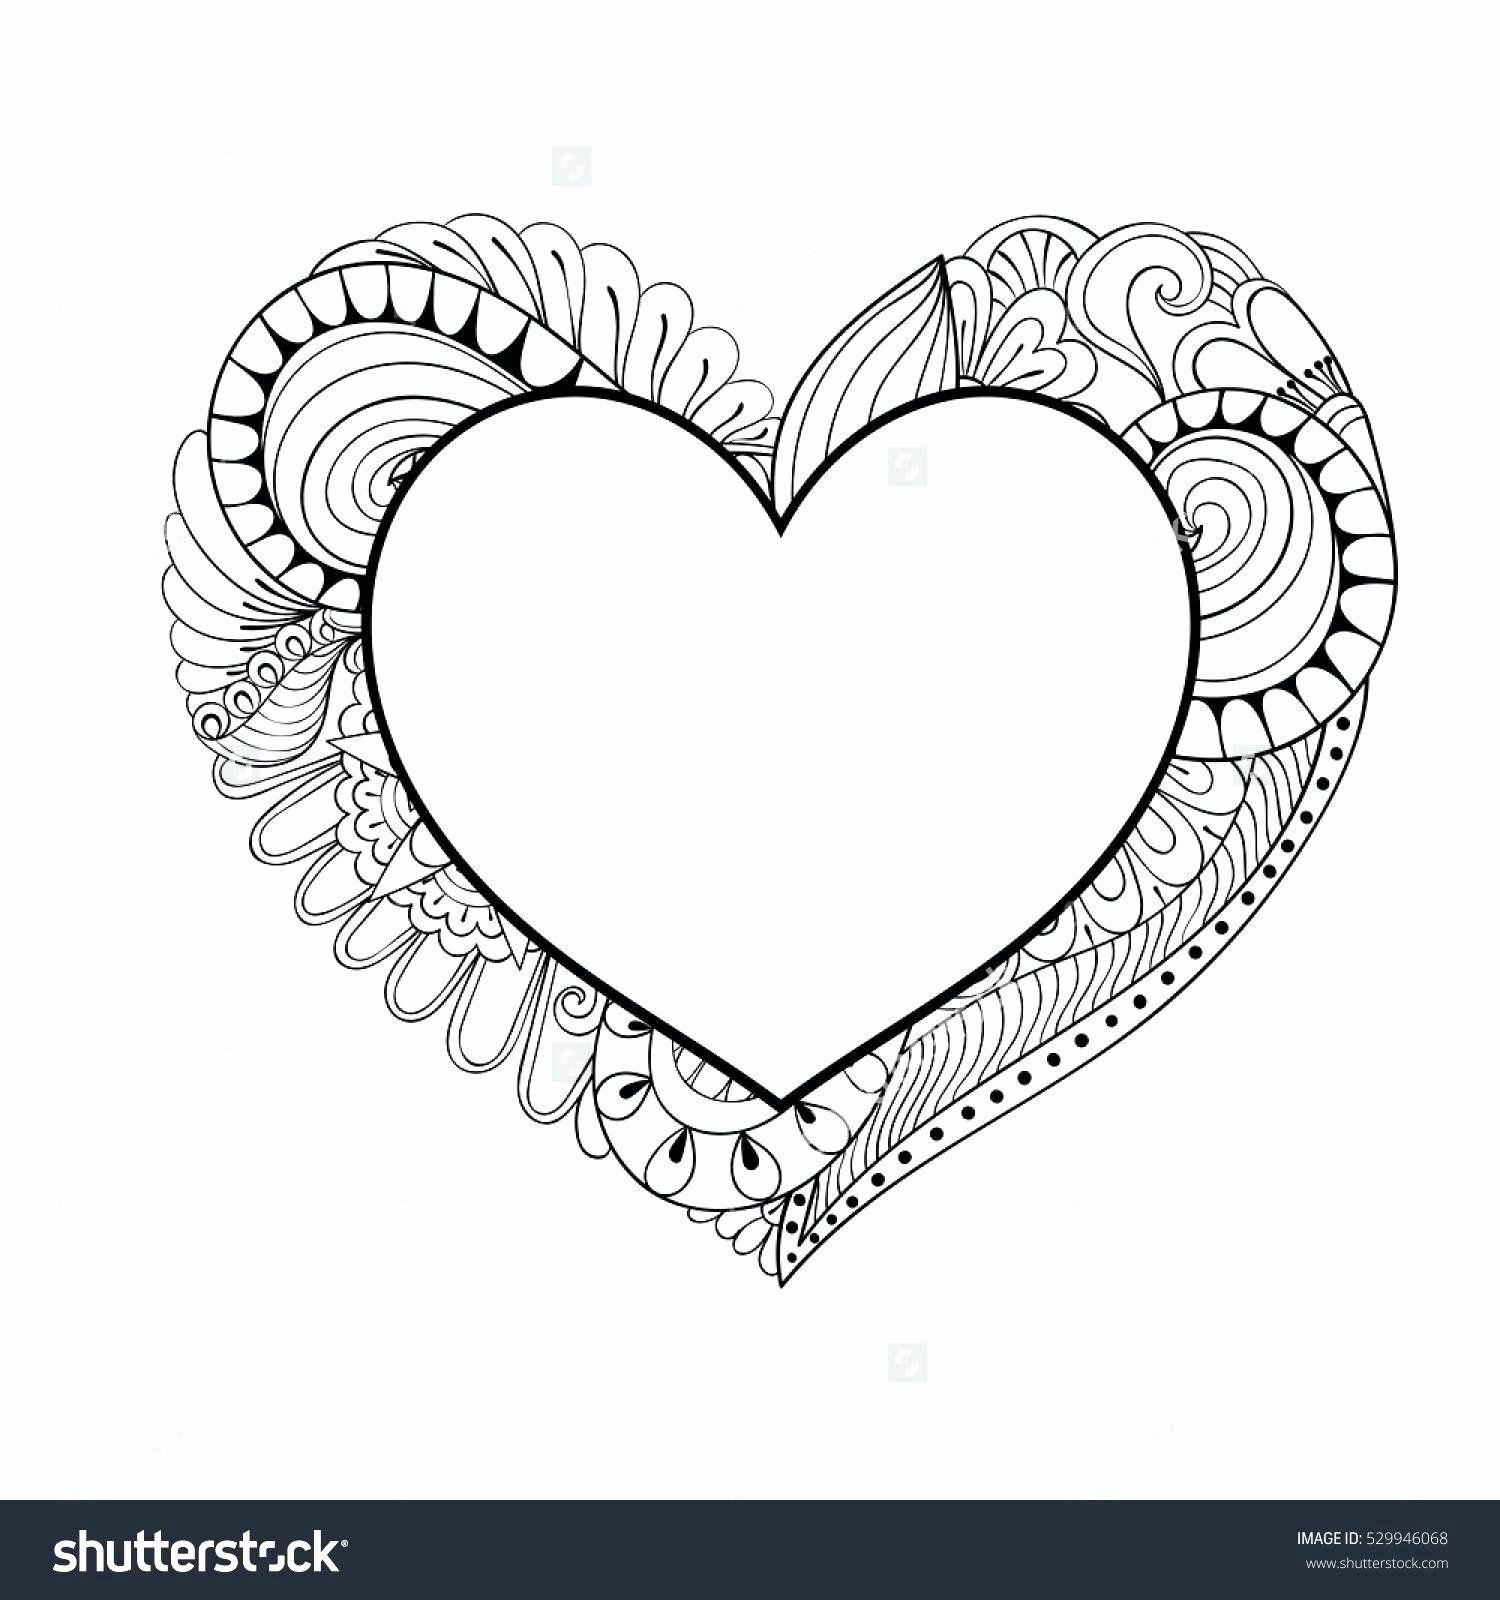 Love Coloring Pages For Kids New Conversation Hearts Coloring Sheets Regionpaper Halaman Mewarnai